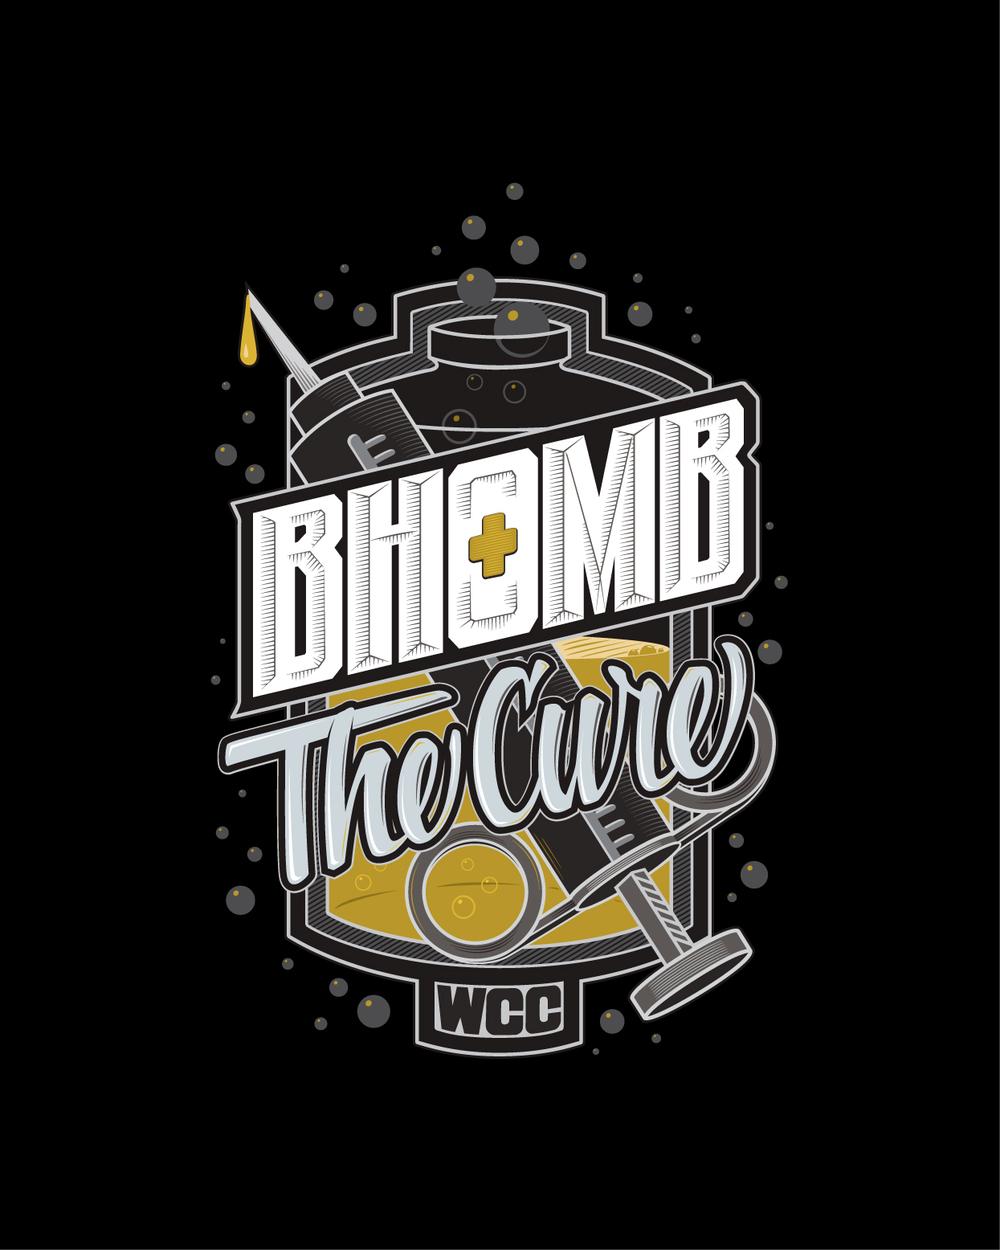 bhomb_cure_FINAL.jpg